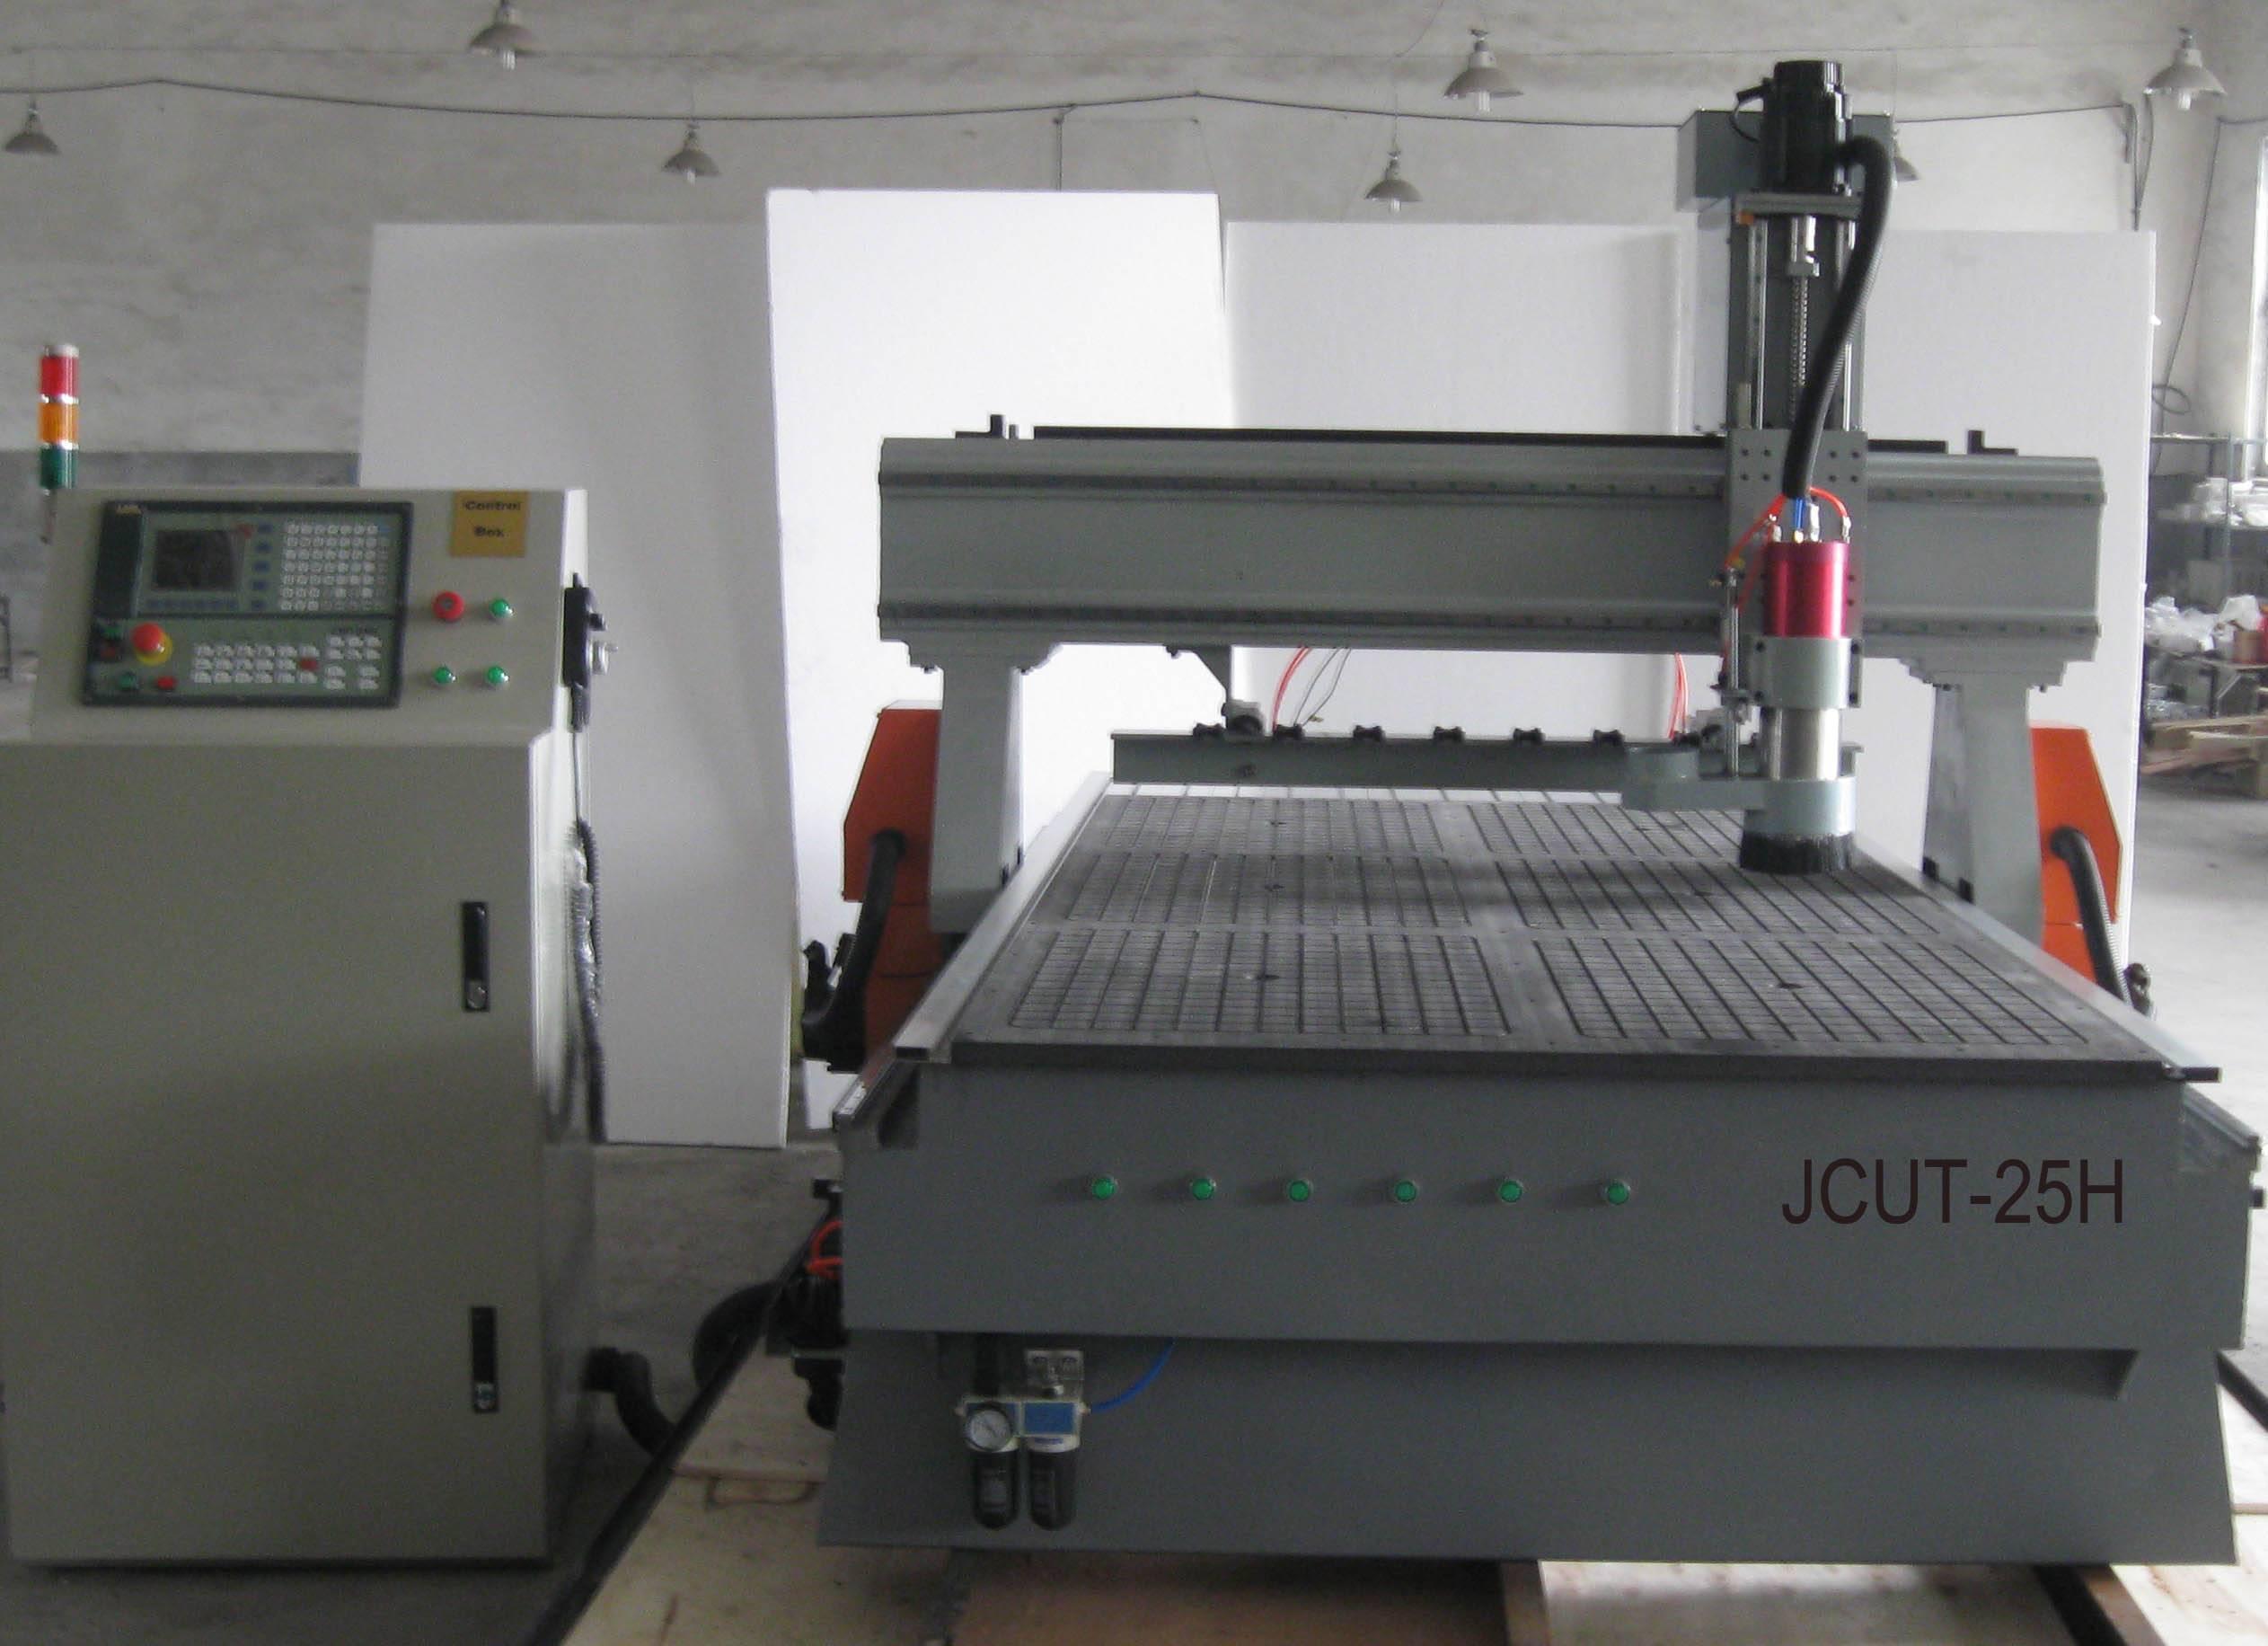 SLAP-UP CNC WOODMAKING MACHINE